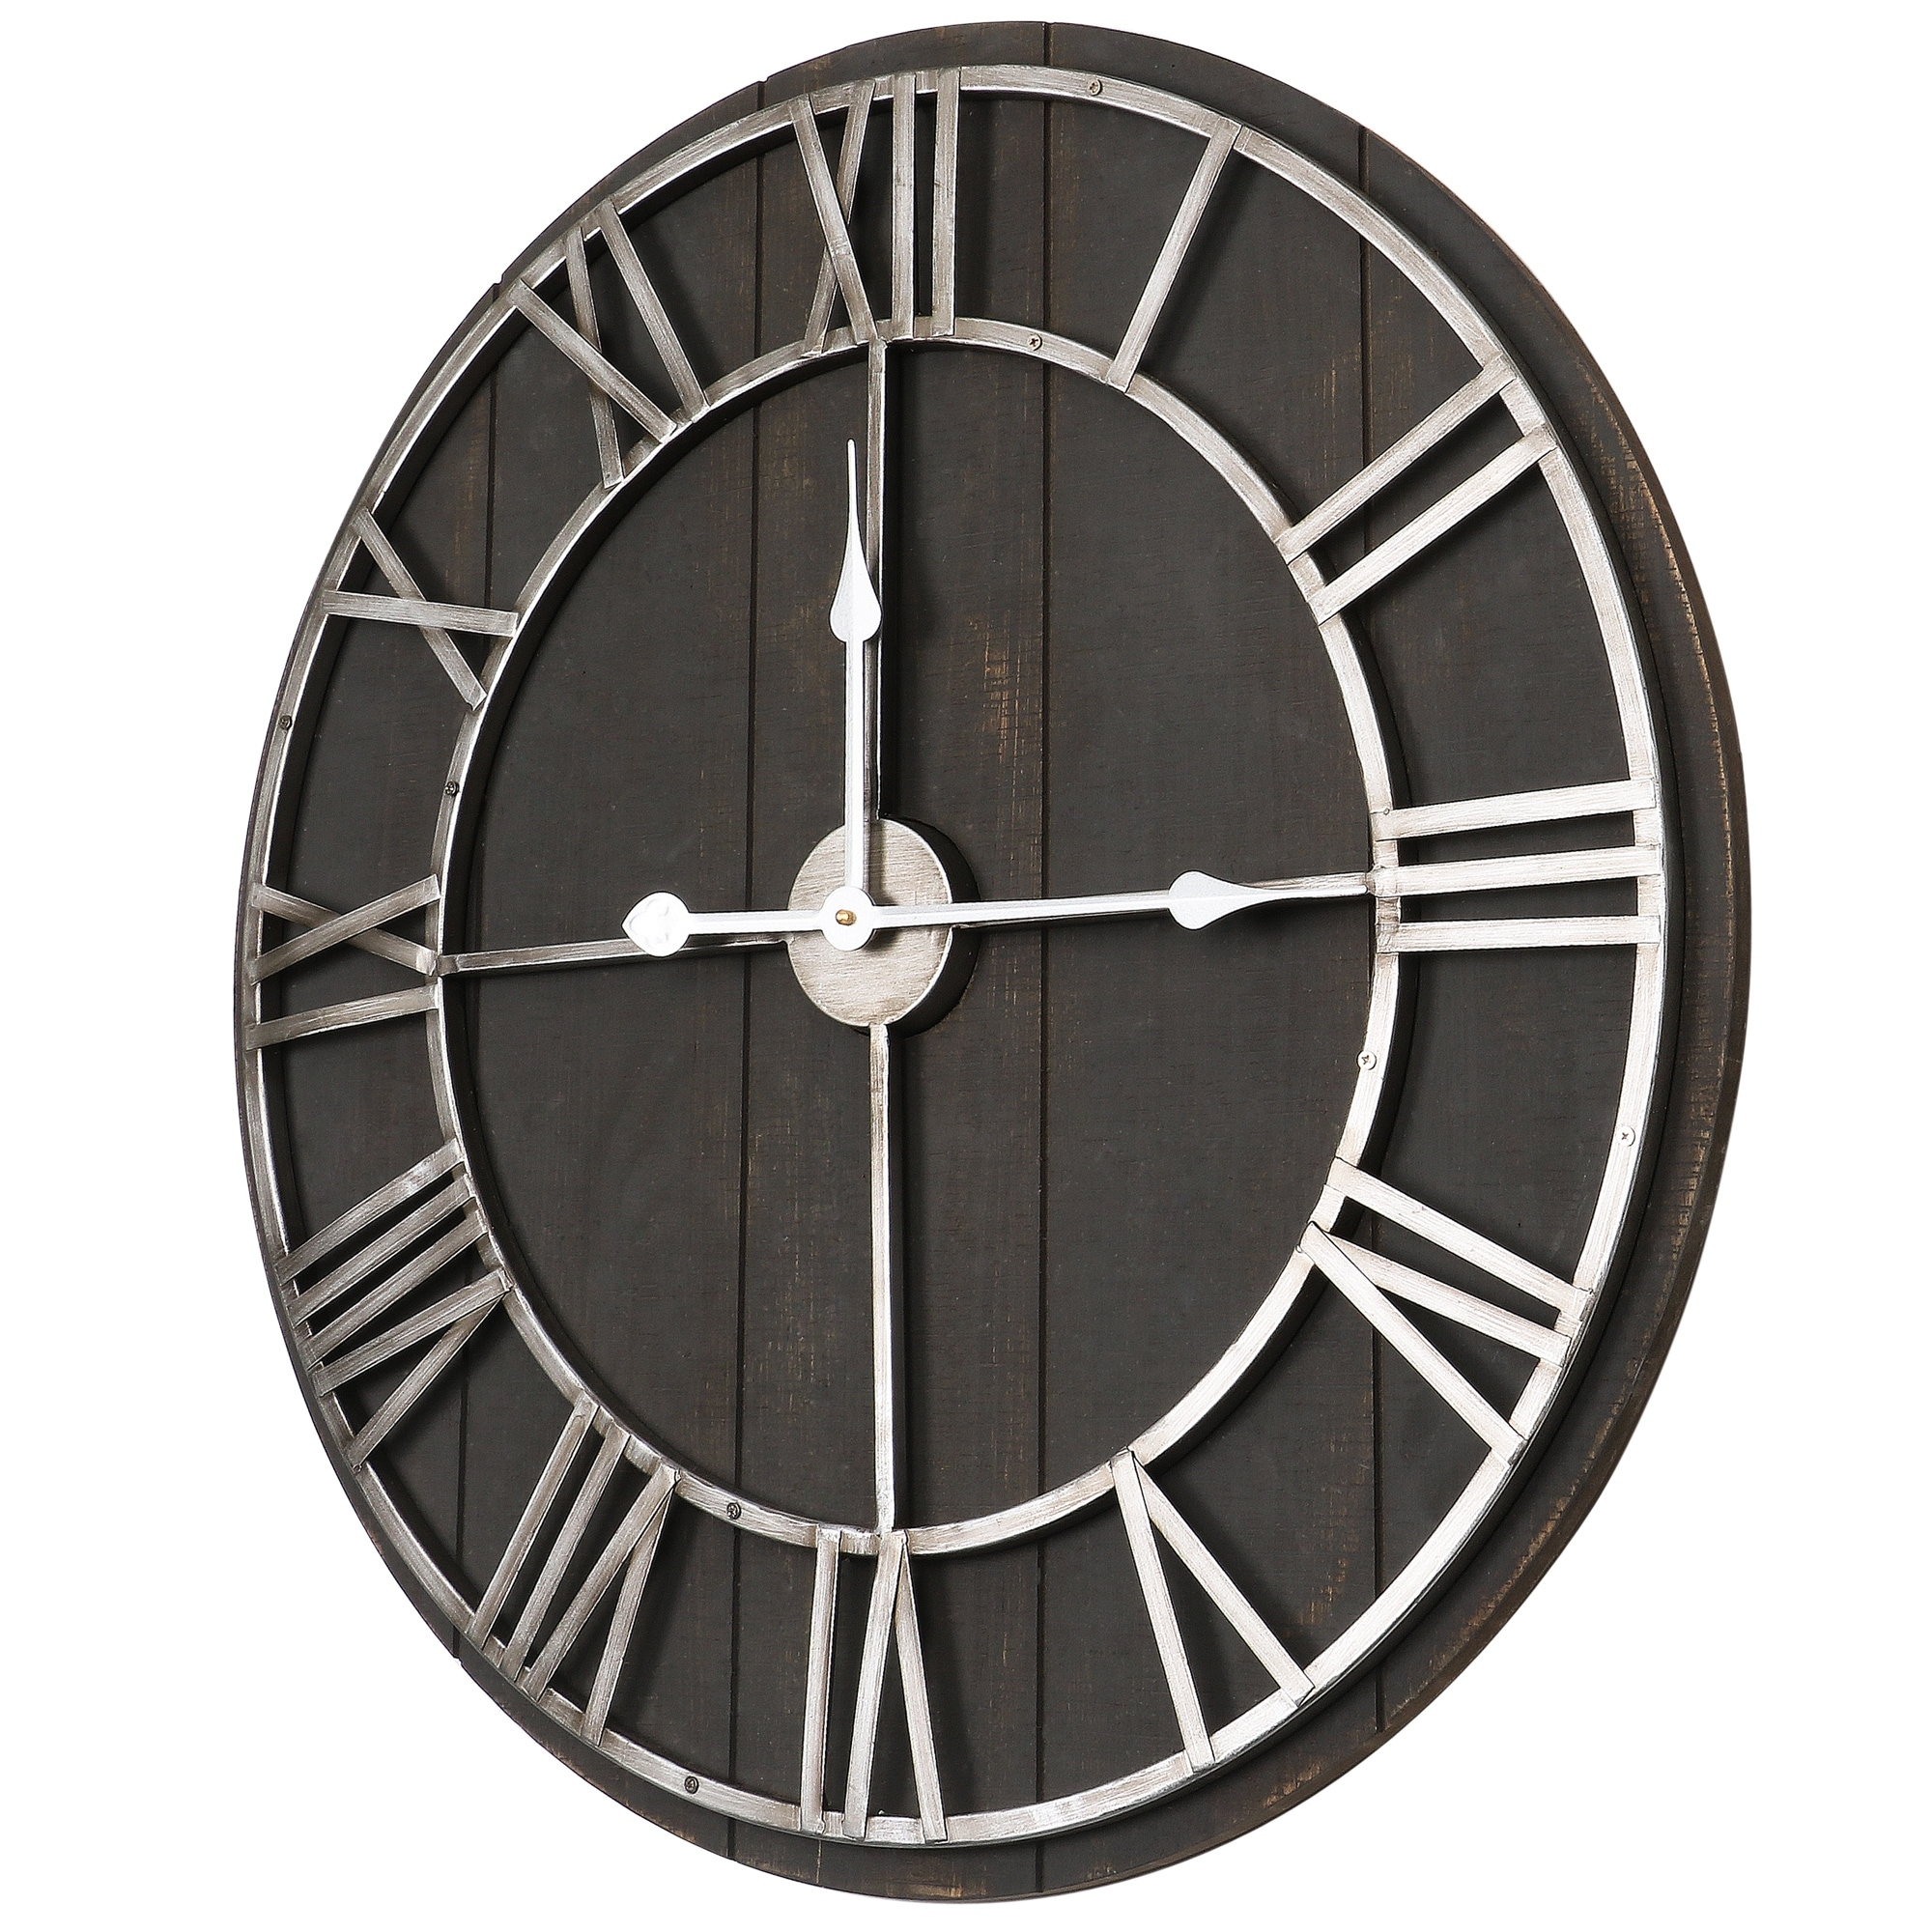 Oversized Roman Round Wall Clock 28 In Dark Wood Finish On Sale Overstock 22522994